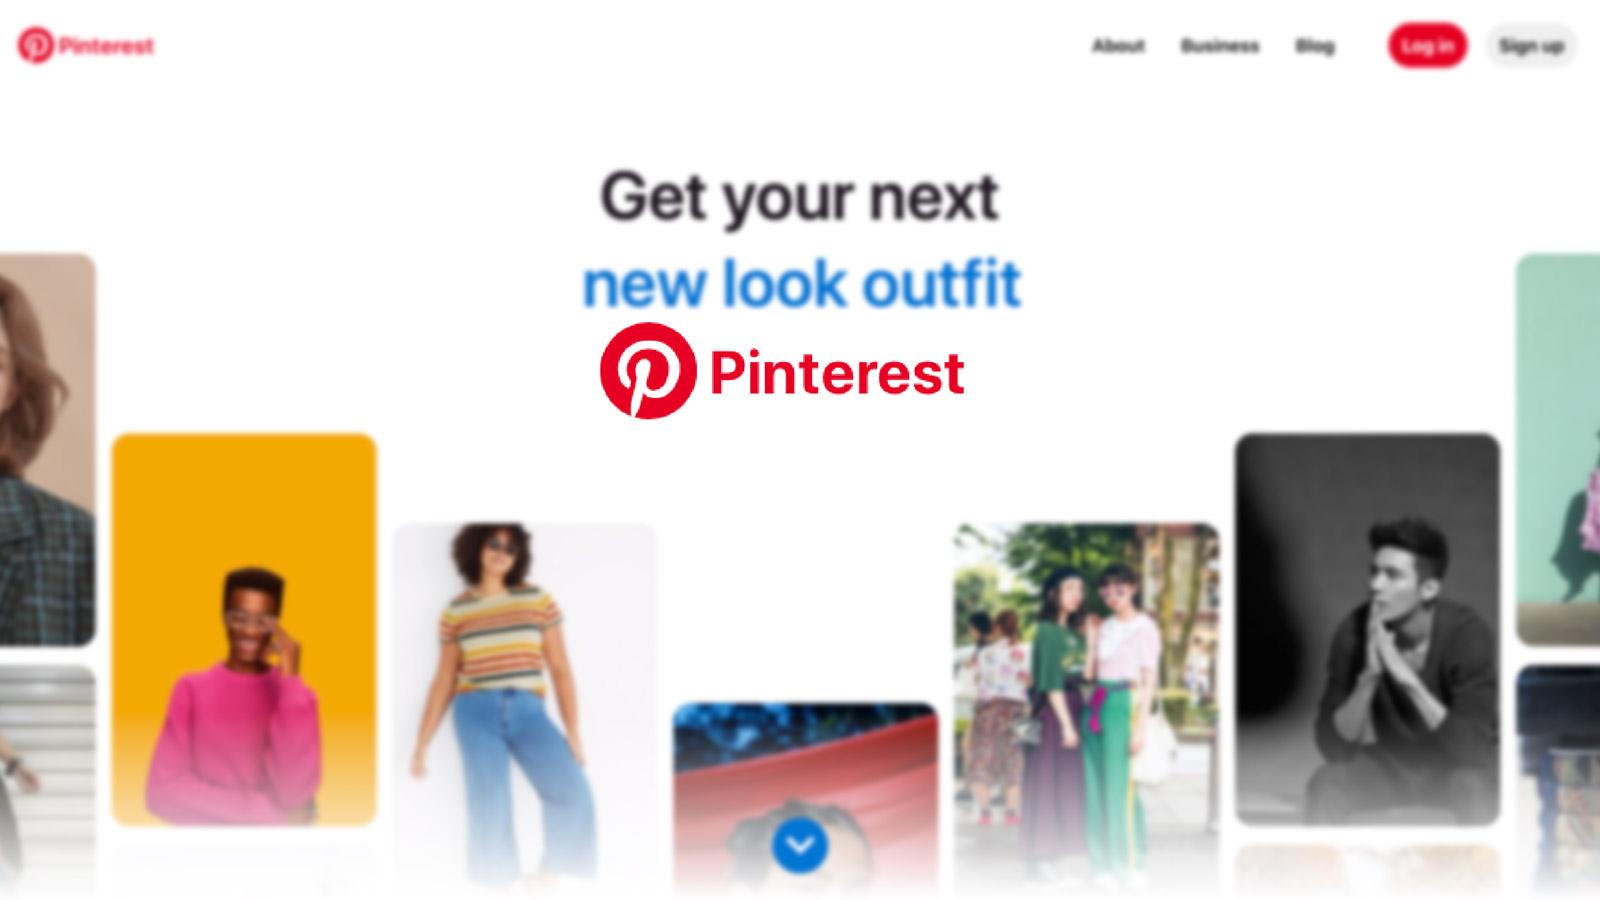 Nowe rozwiązania reklamowe Pinteresta dla e-commerce Social media mediarun pintrest social media e commerce 2020